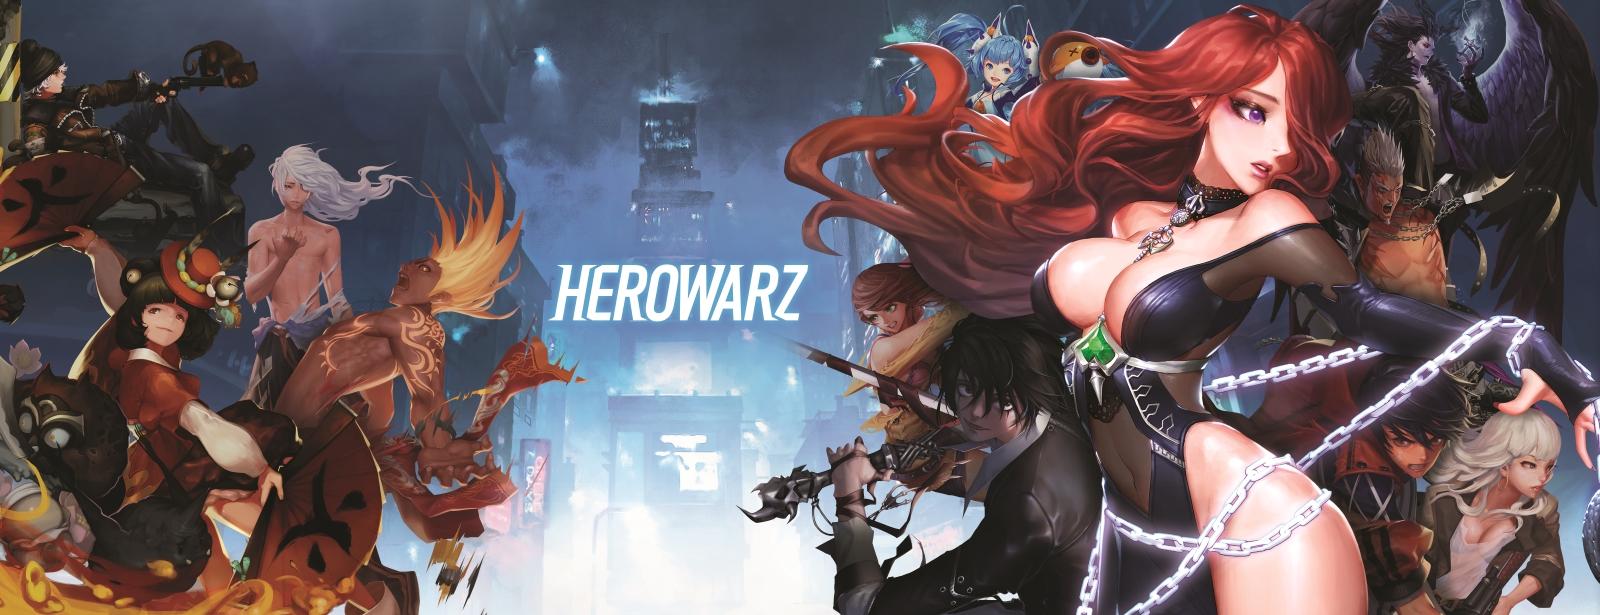 HeroWarz Closed Beta Now Live